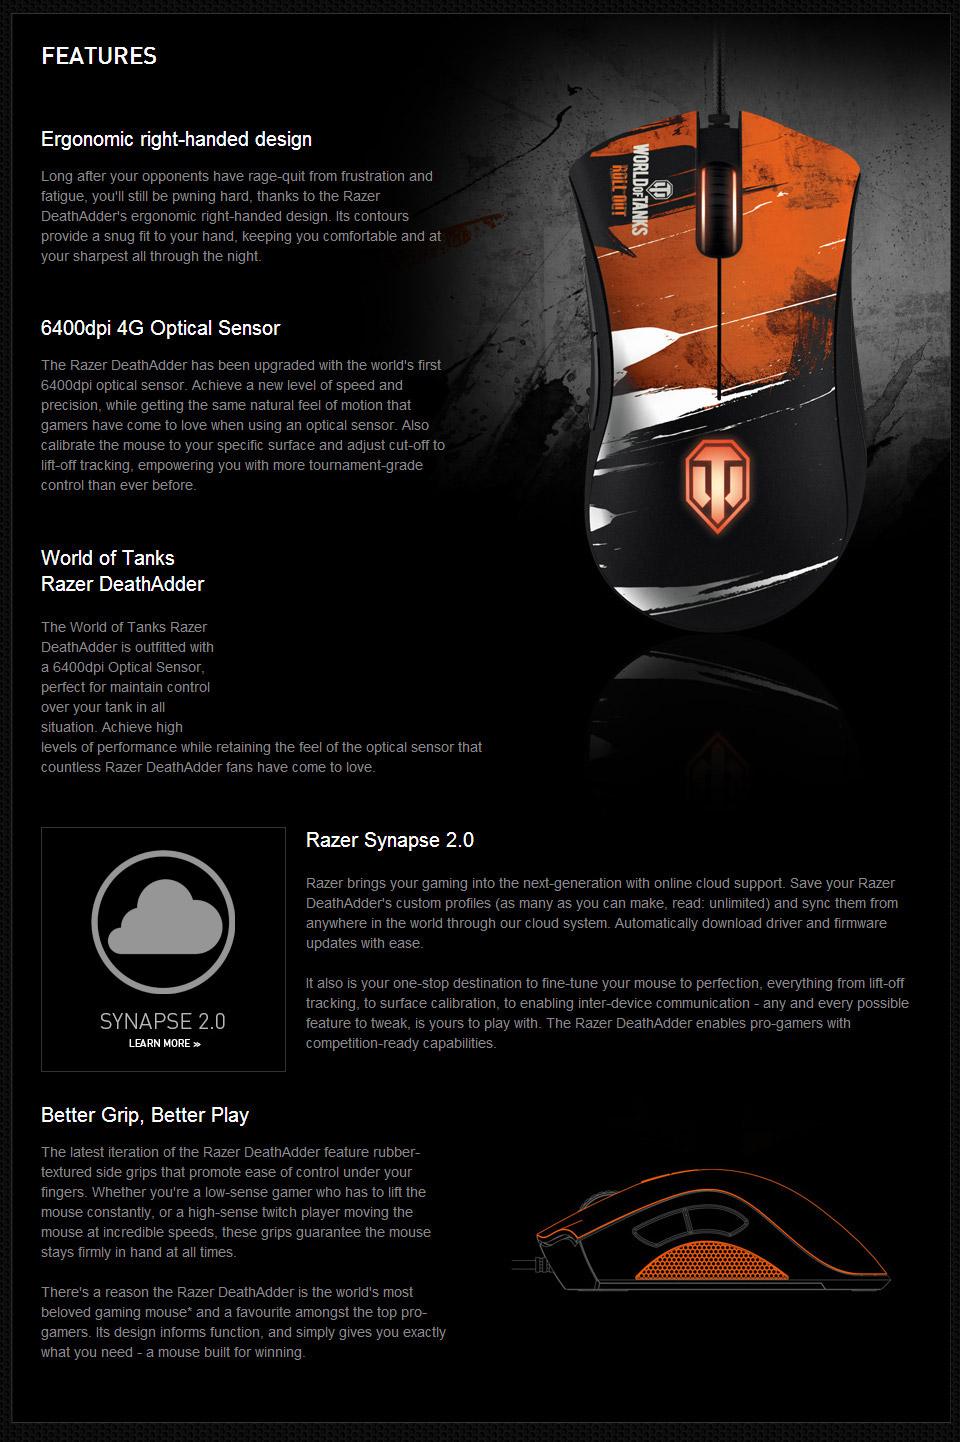 Razer DeathAdder Gaming Mouse World of Tanks Edition [RZ